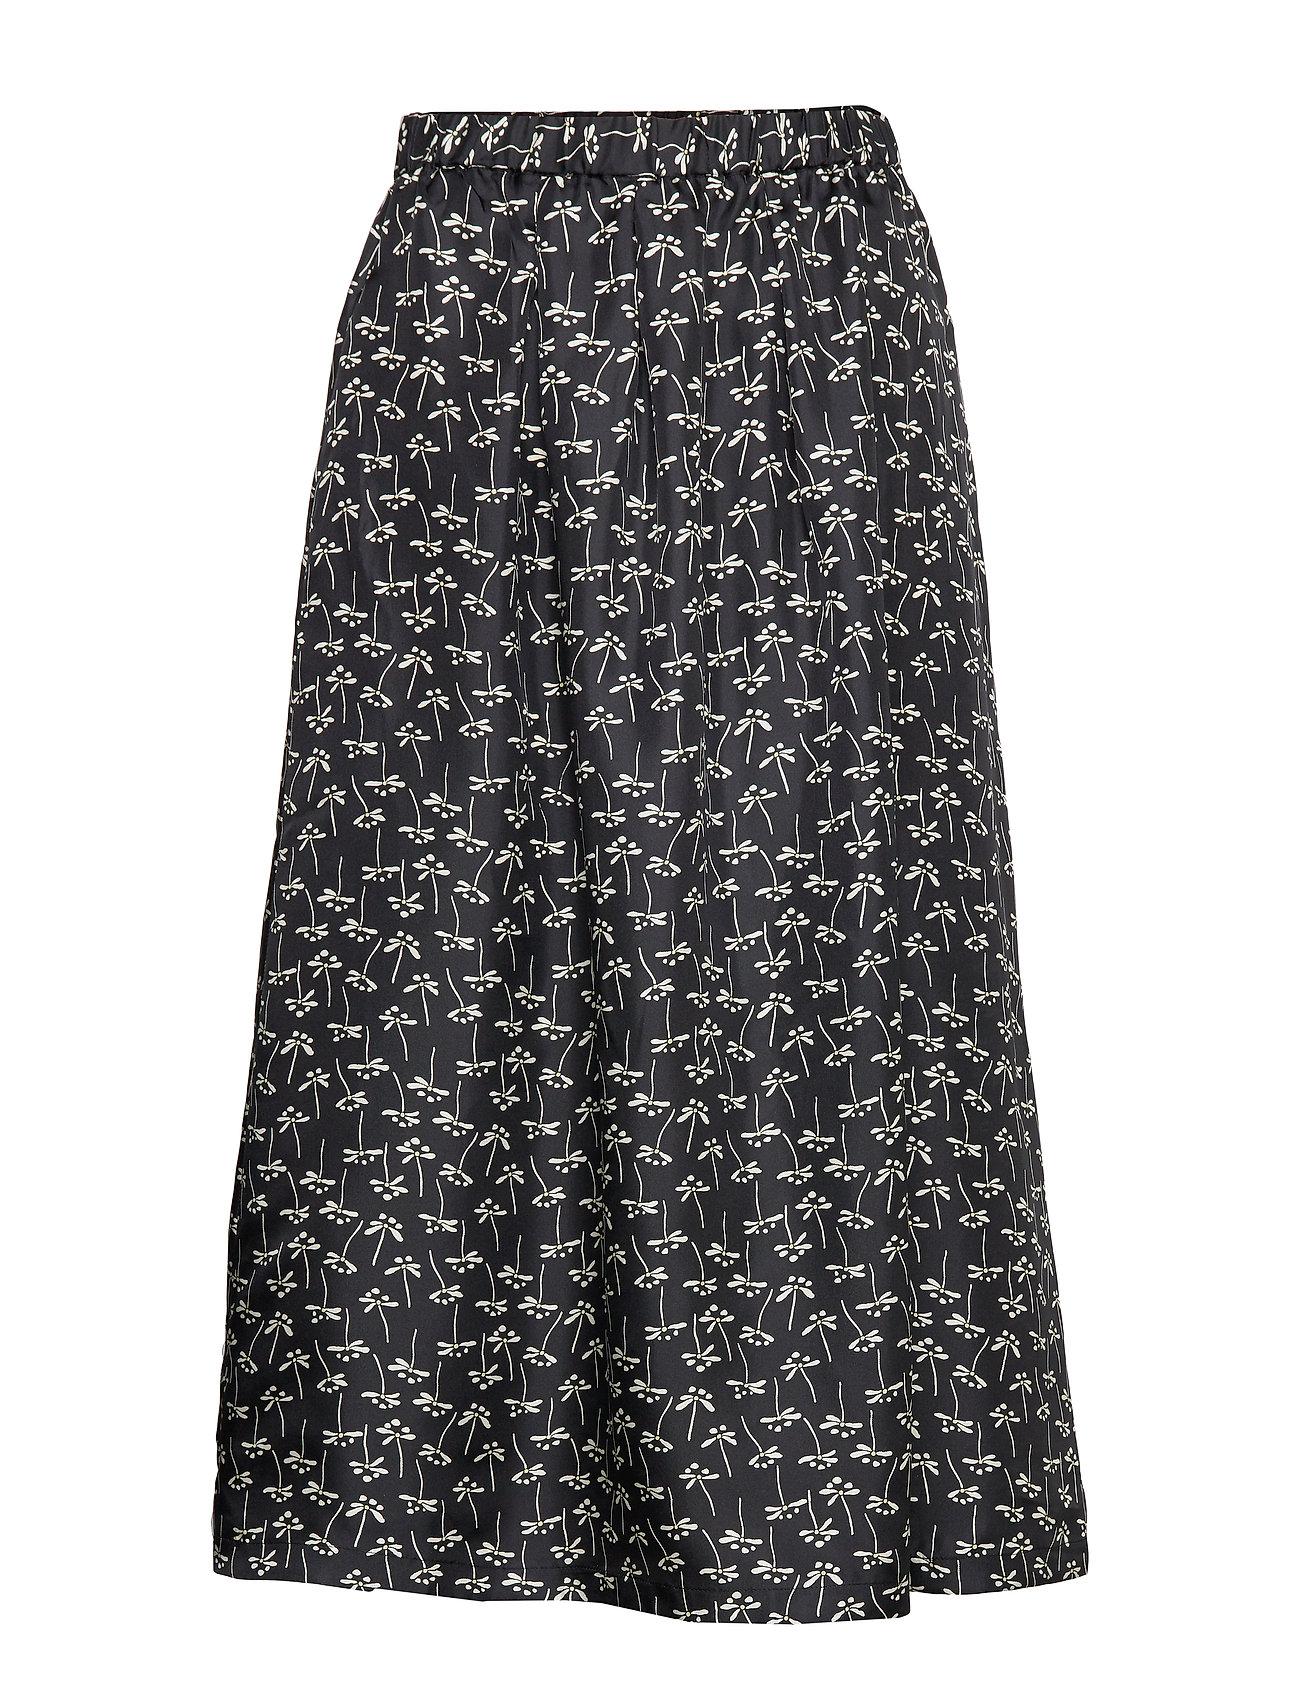 nué notes Doma Skirt - BLACK